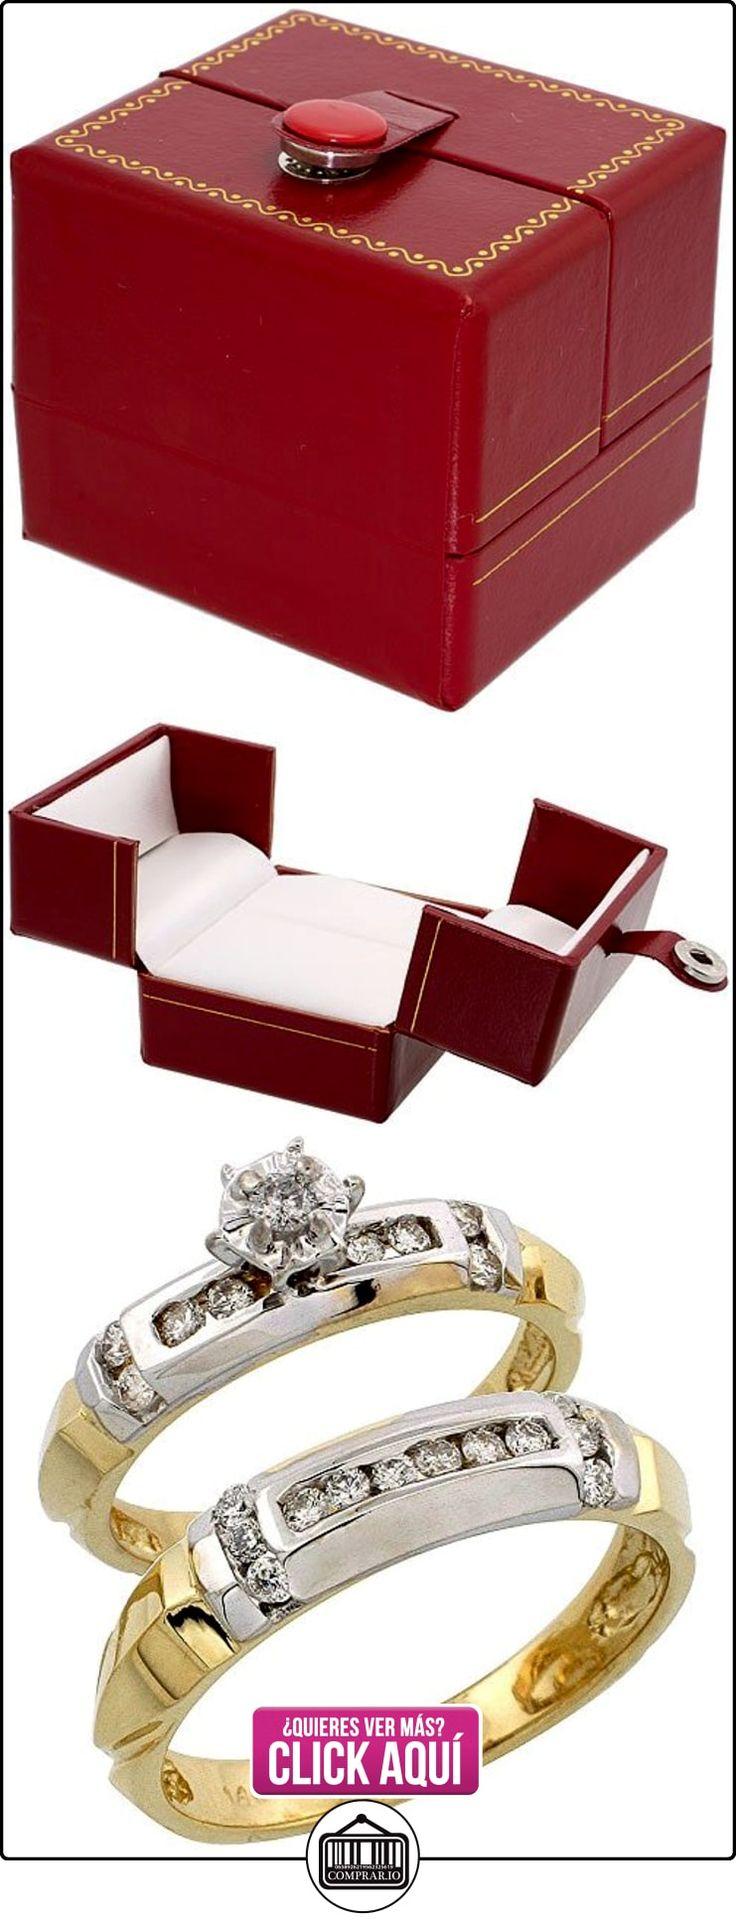 Revoni - Anillo de compromiso de oro amarillo  ✿ Joyas para hombres especiales - lujo ✿ ▬► Ver oferta: https://comprar.io/goto/B004SN1DCY